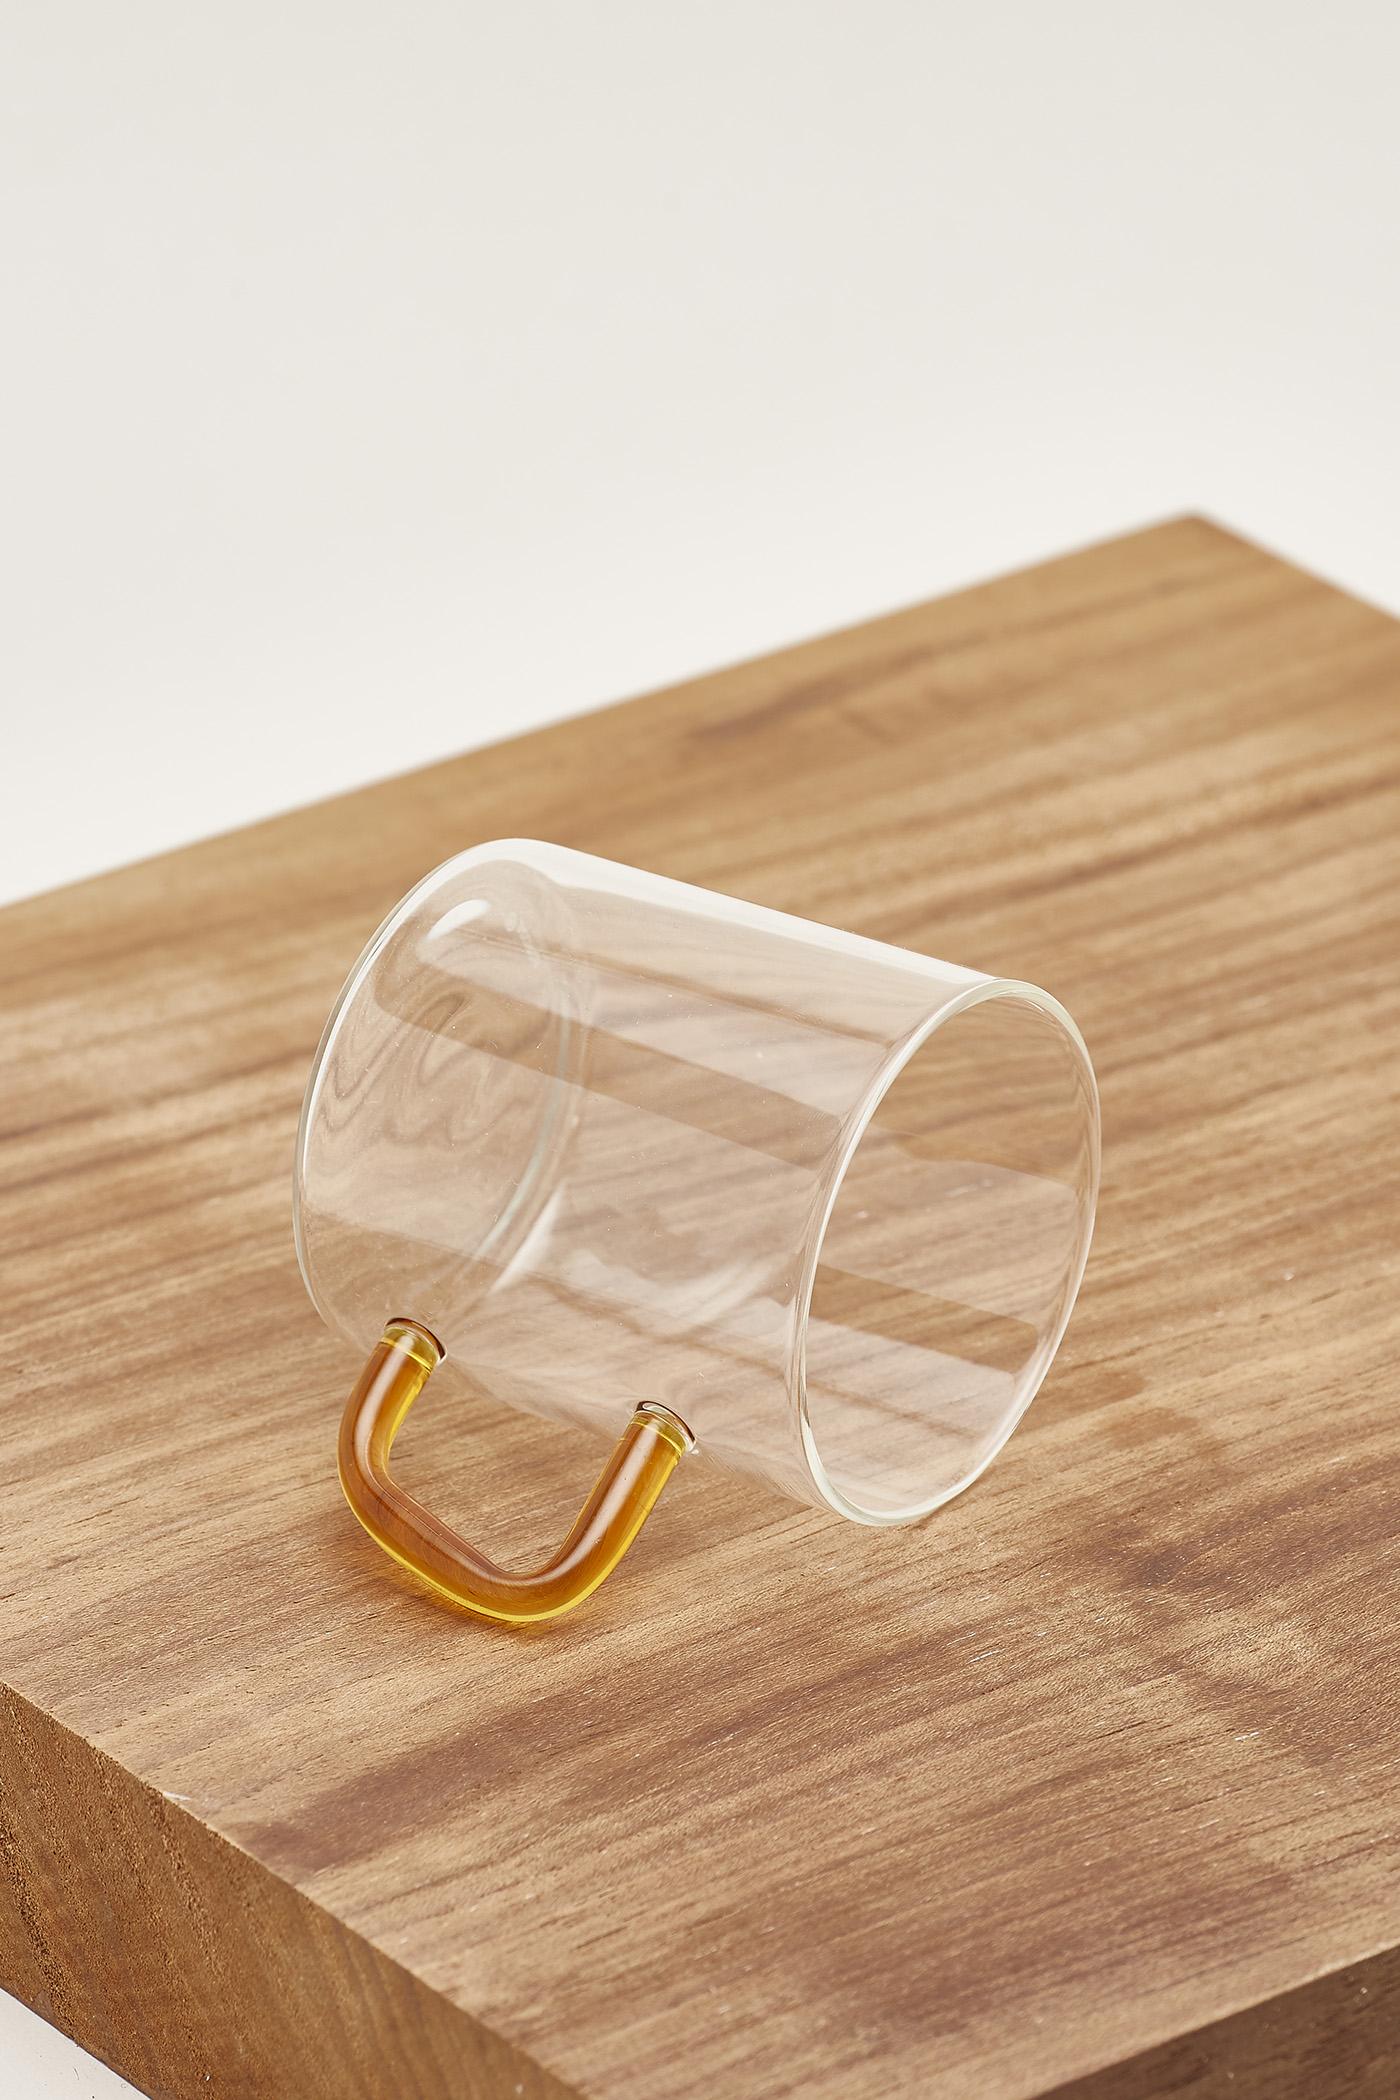 Koemi Clear Small Mug